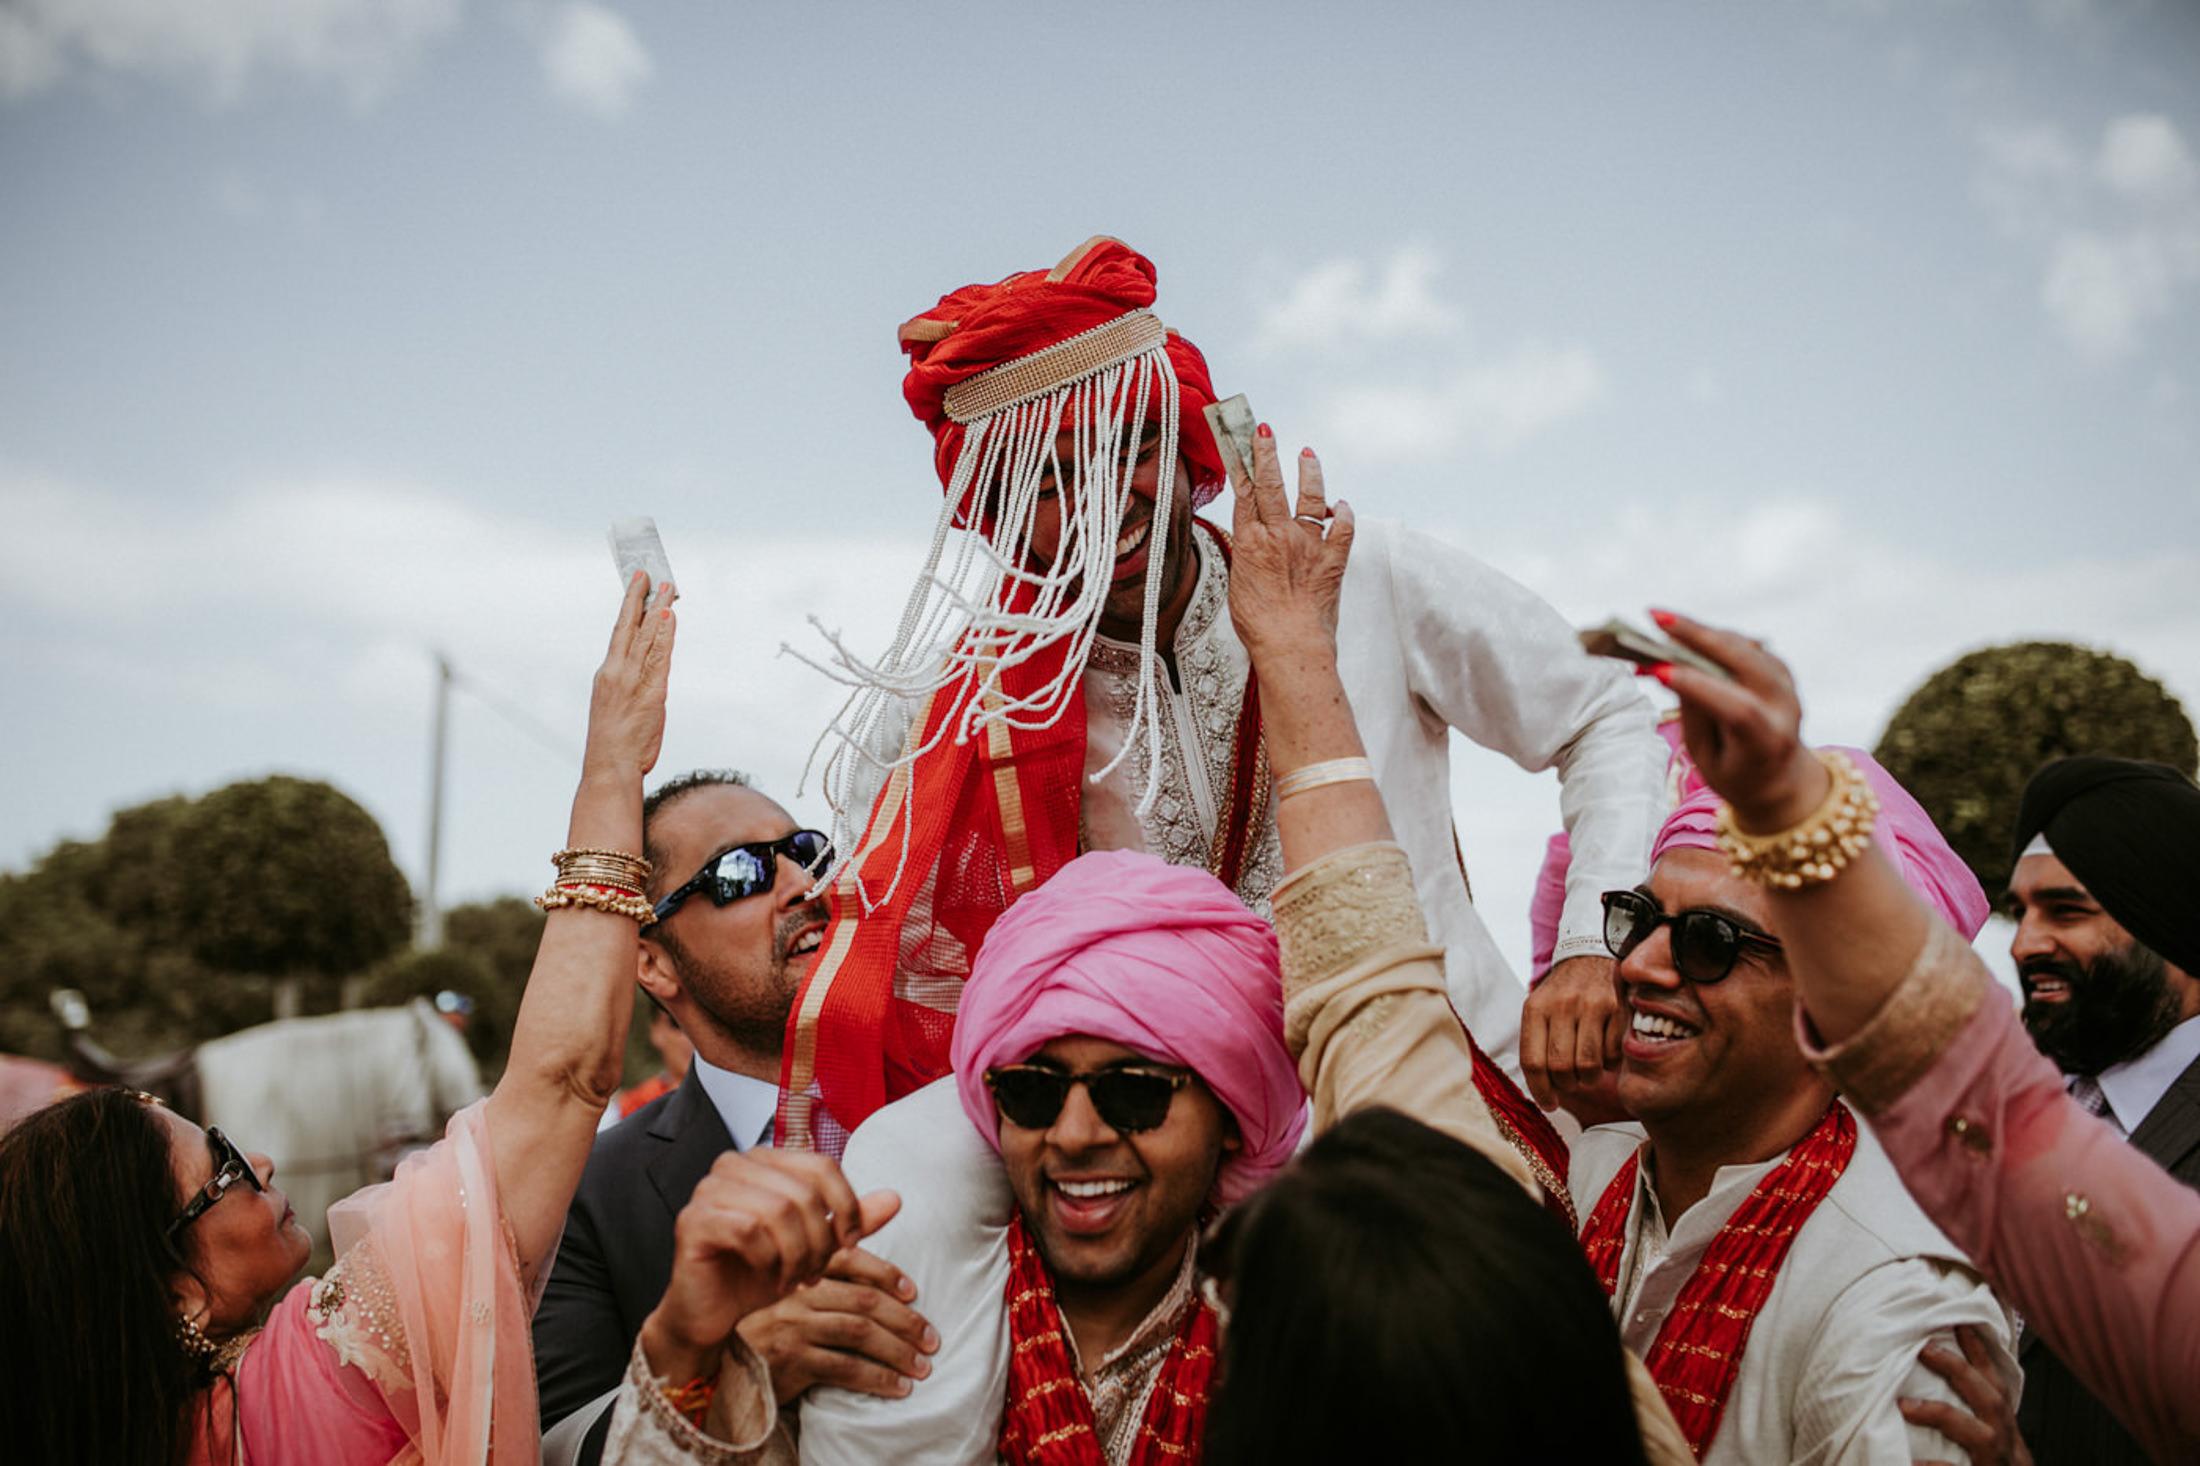 Wedding_Photographer_Mallorca_Daniela-Marquardt_Photography_New_York_Iceland_Tuscany_Santorini_Portugal_Austria_Bavaria_Elopement_Hochzeitsfotograf_AntjeRajat2_34